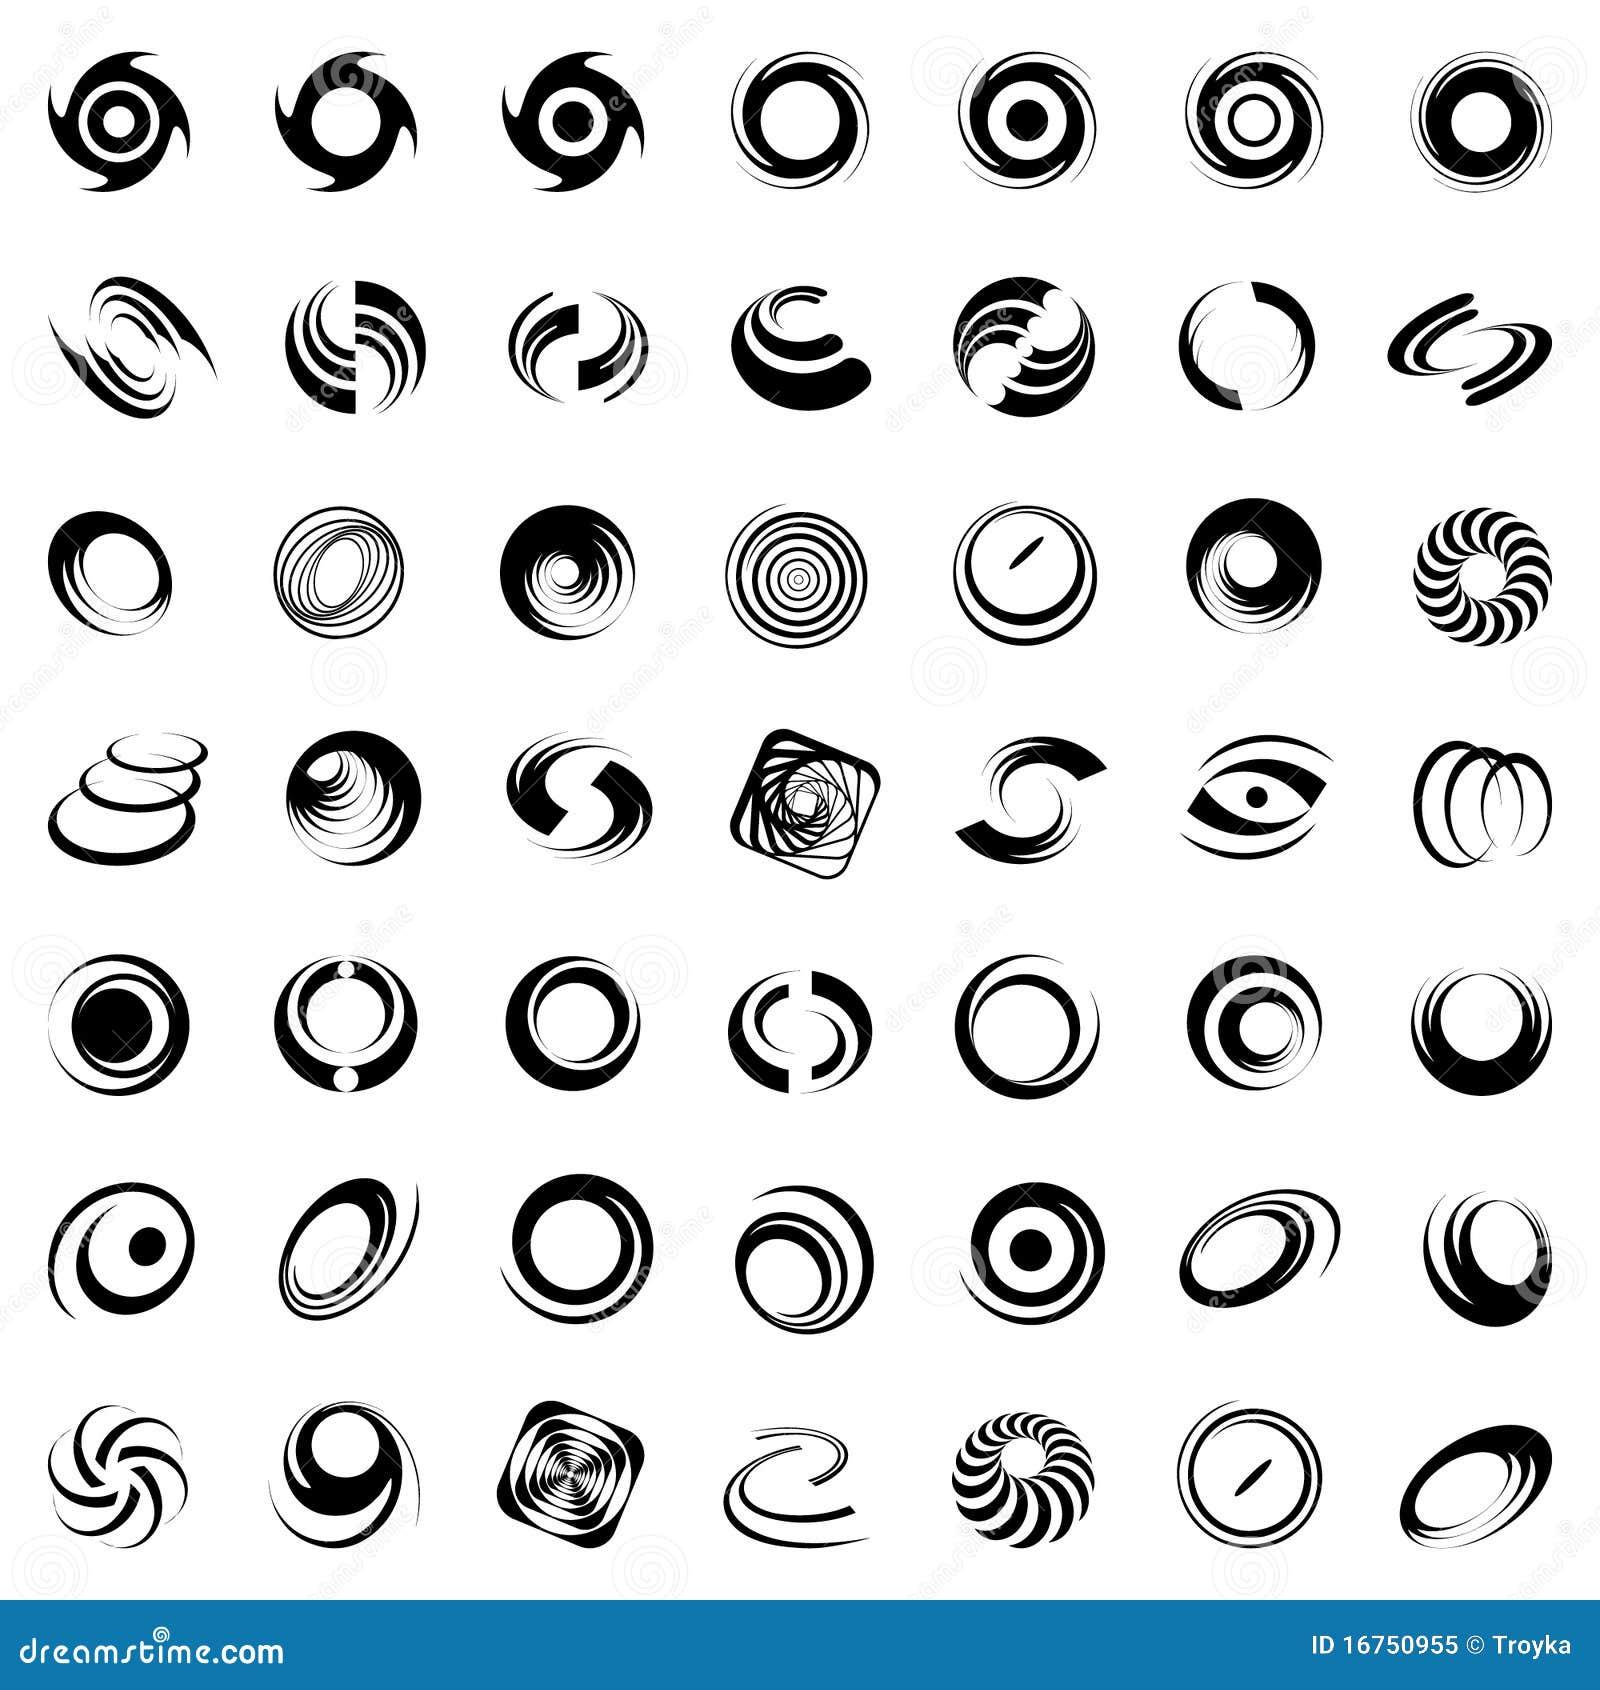 Spiraalvormige beweging en omwenteling. 49 ontwerpelementen.